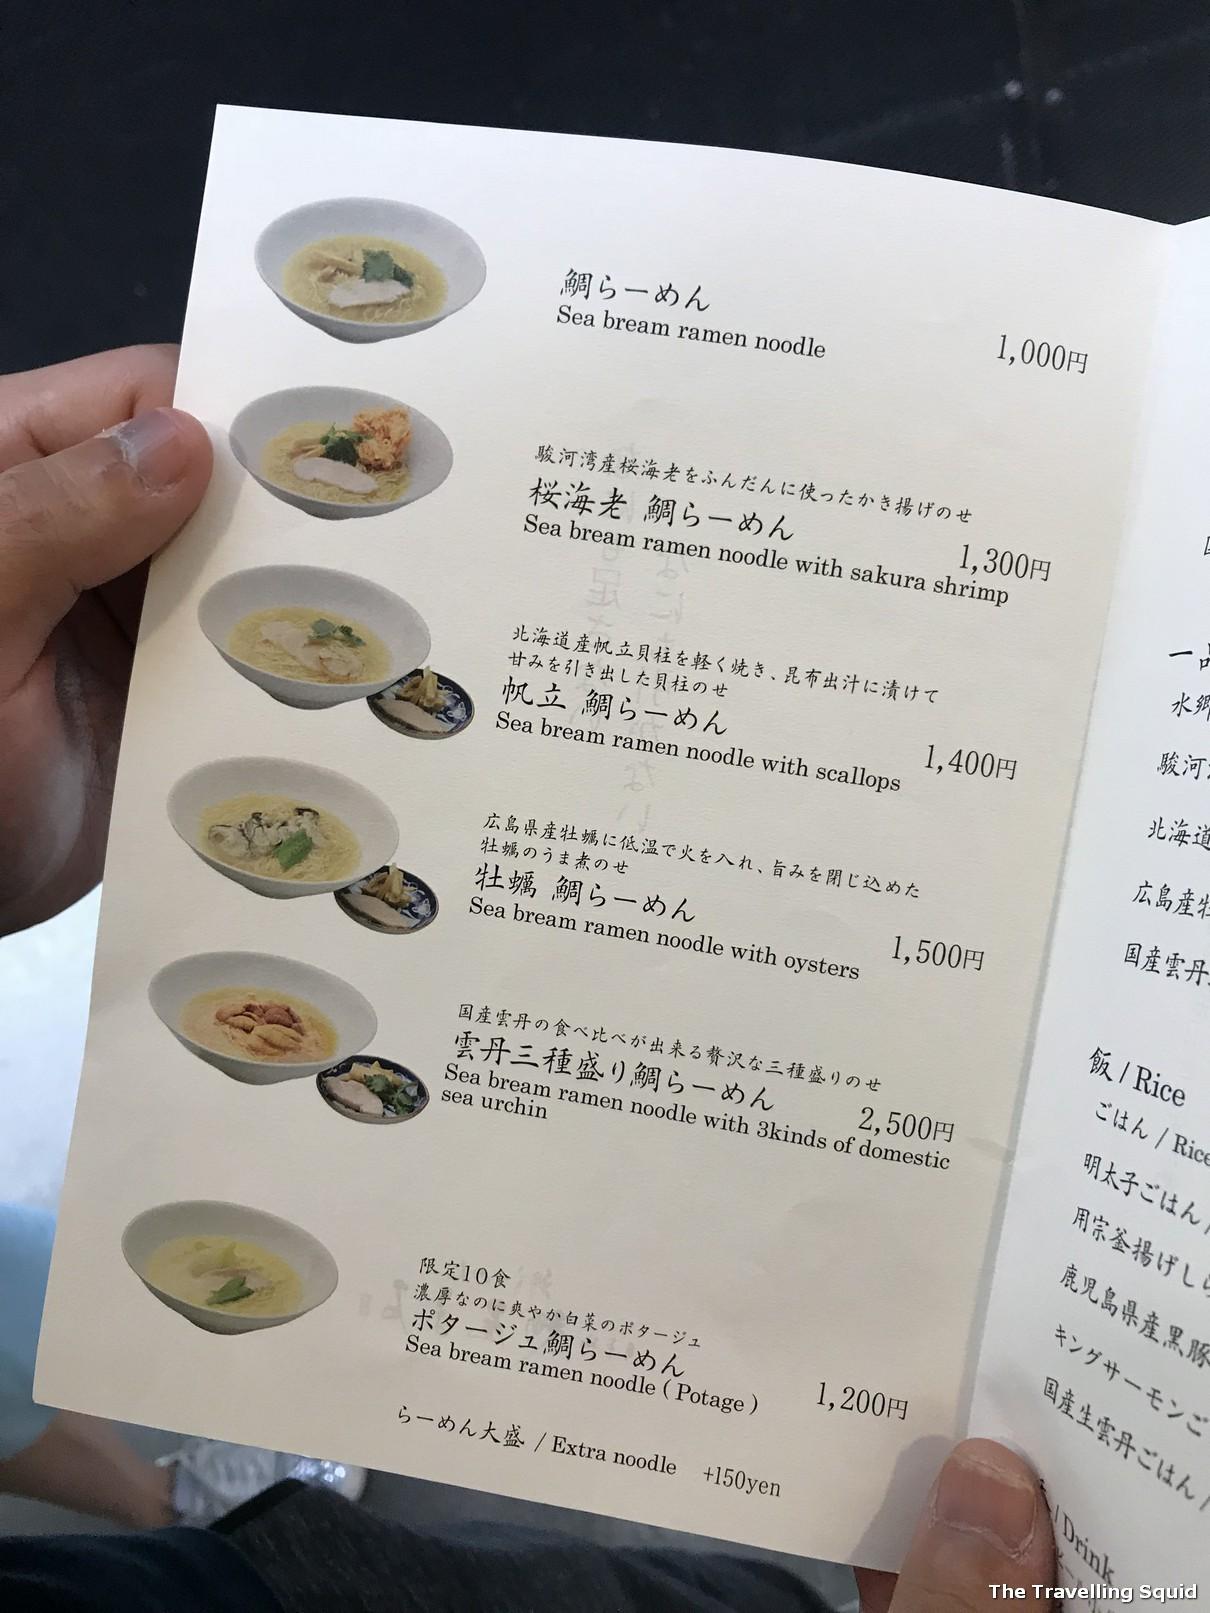 sea bream ramen at Menya Maishi in Ginza Tokyo menu